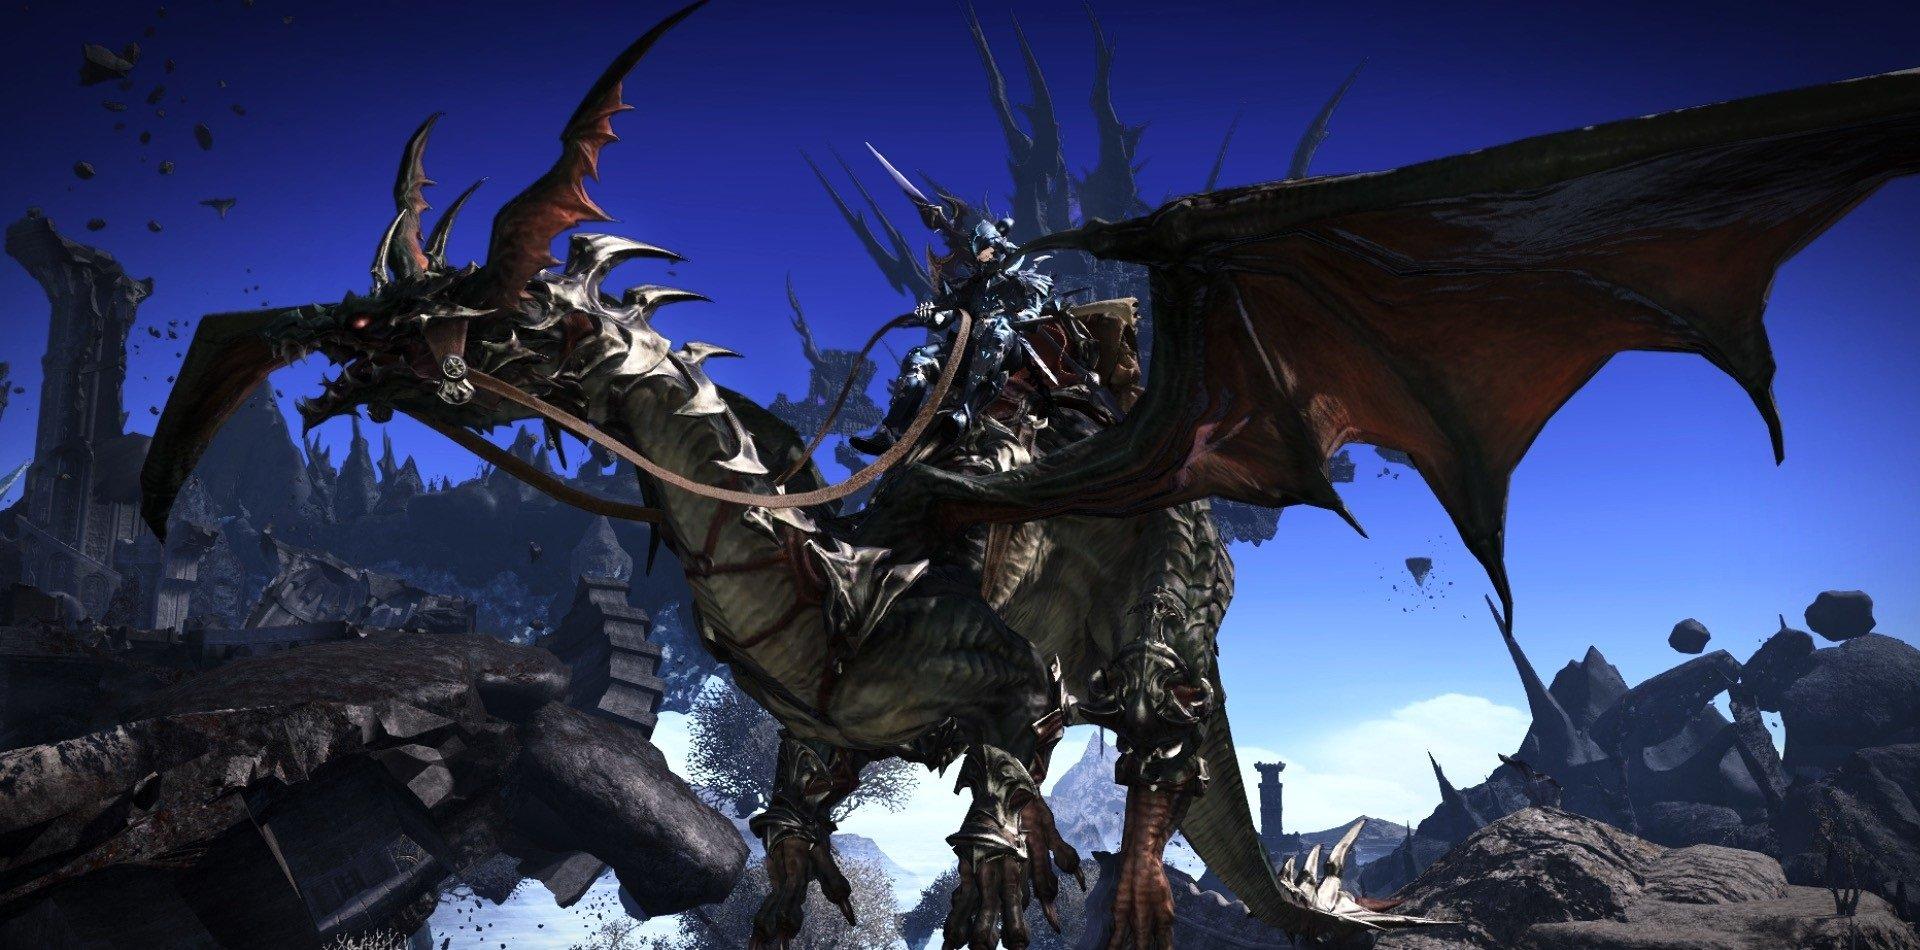 Final Fantasy XIV Heavensward final fantasy 14 Heavensward gratis